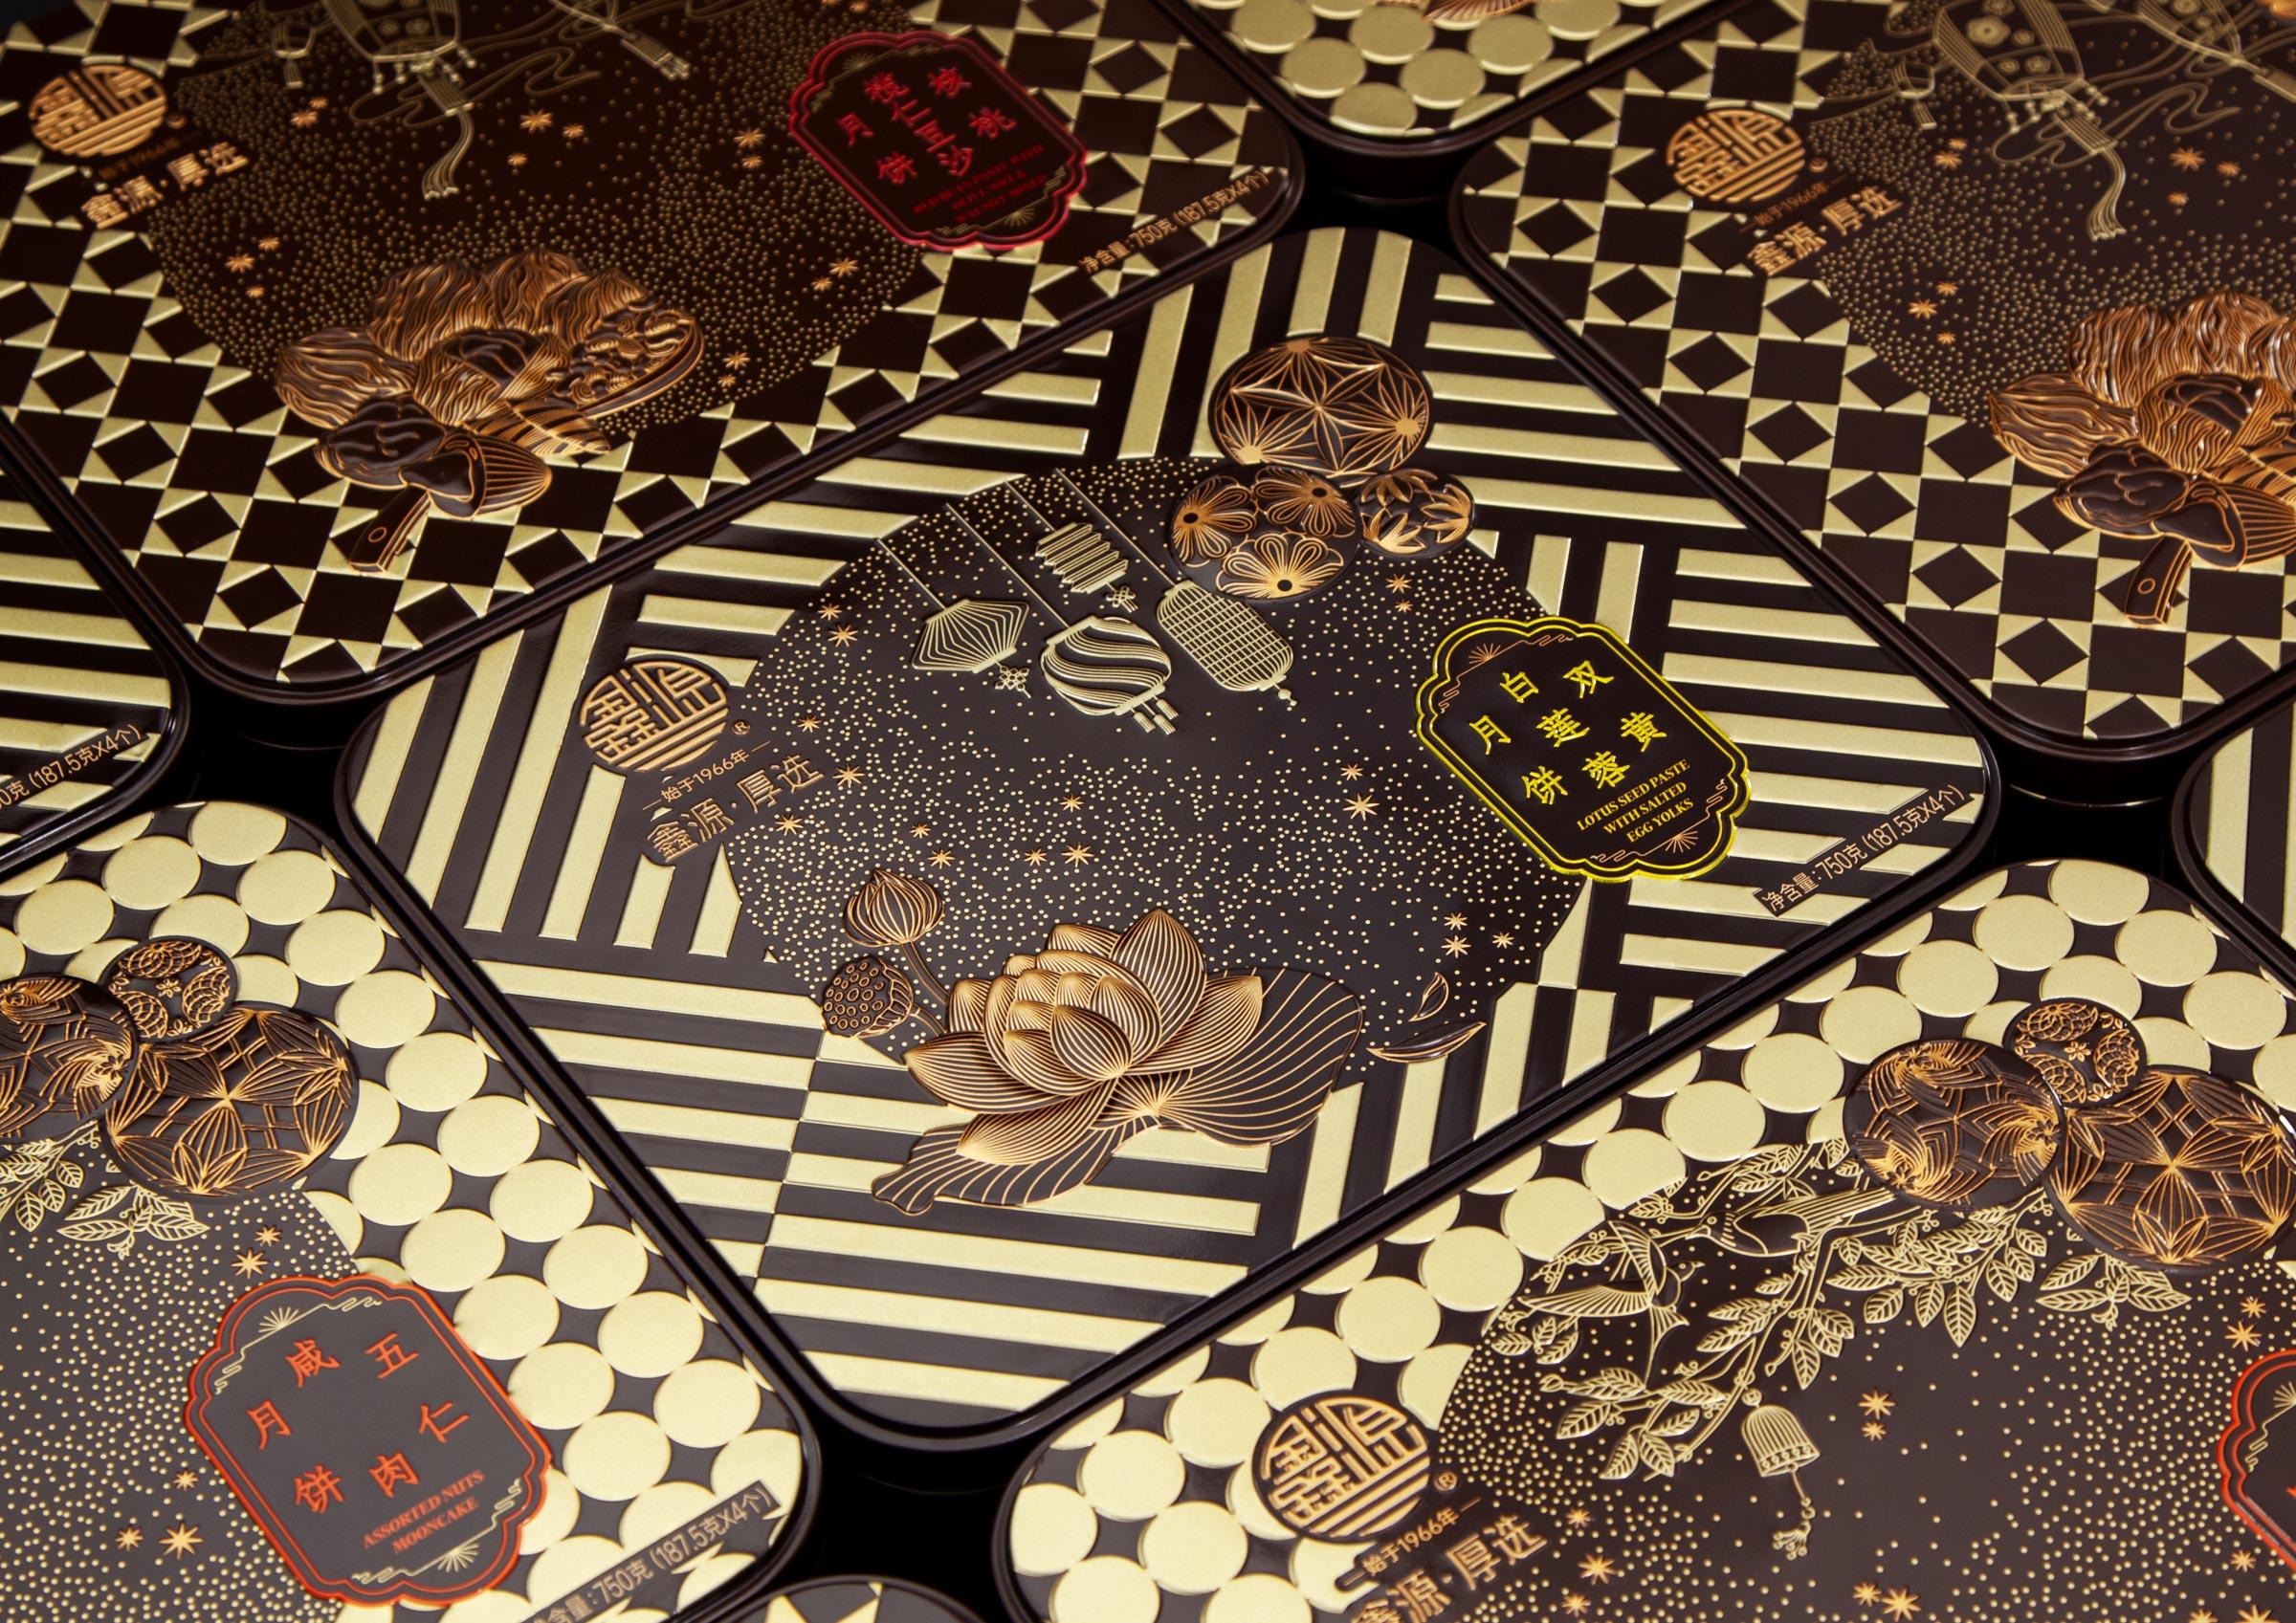 Box Brand Design Create Packaging Design for Xin Yuan Mooncake Golden Series